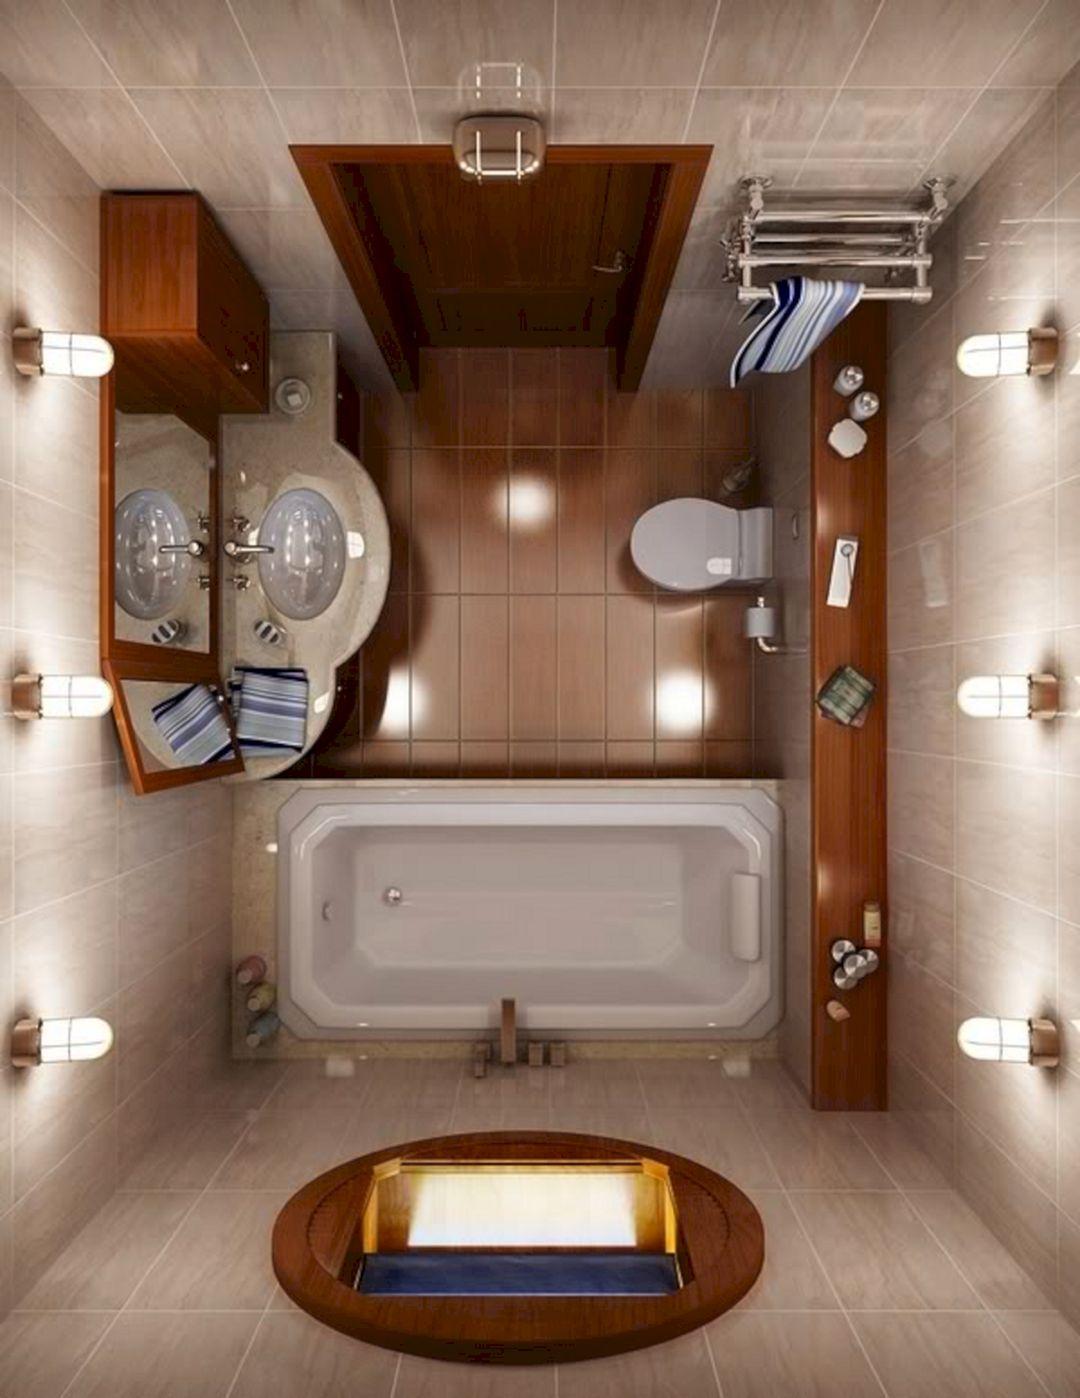 Small bathroom design ideas small bathroom design ideas for Bathroom images for small bathroom